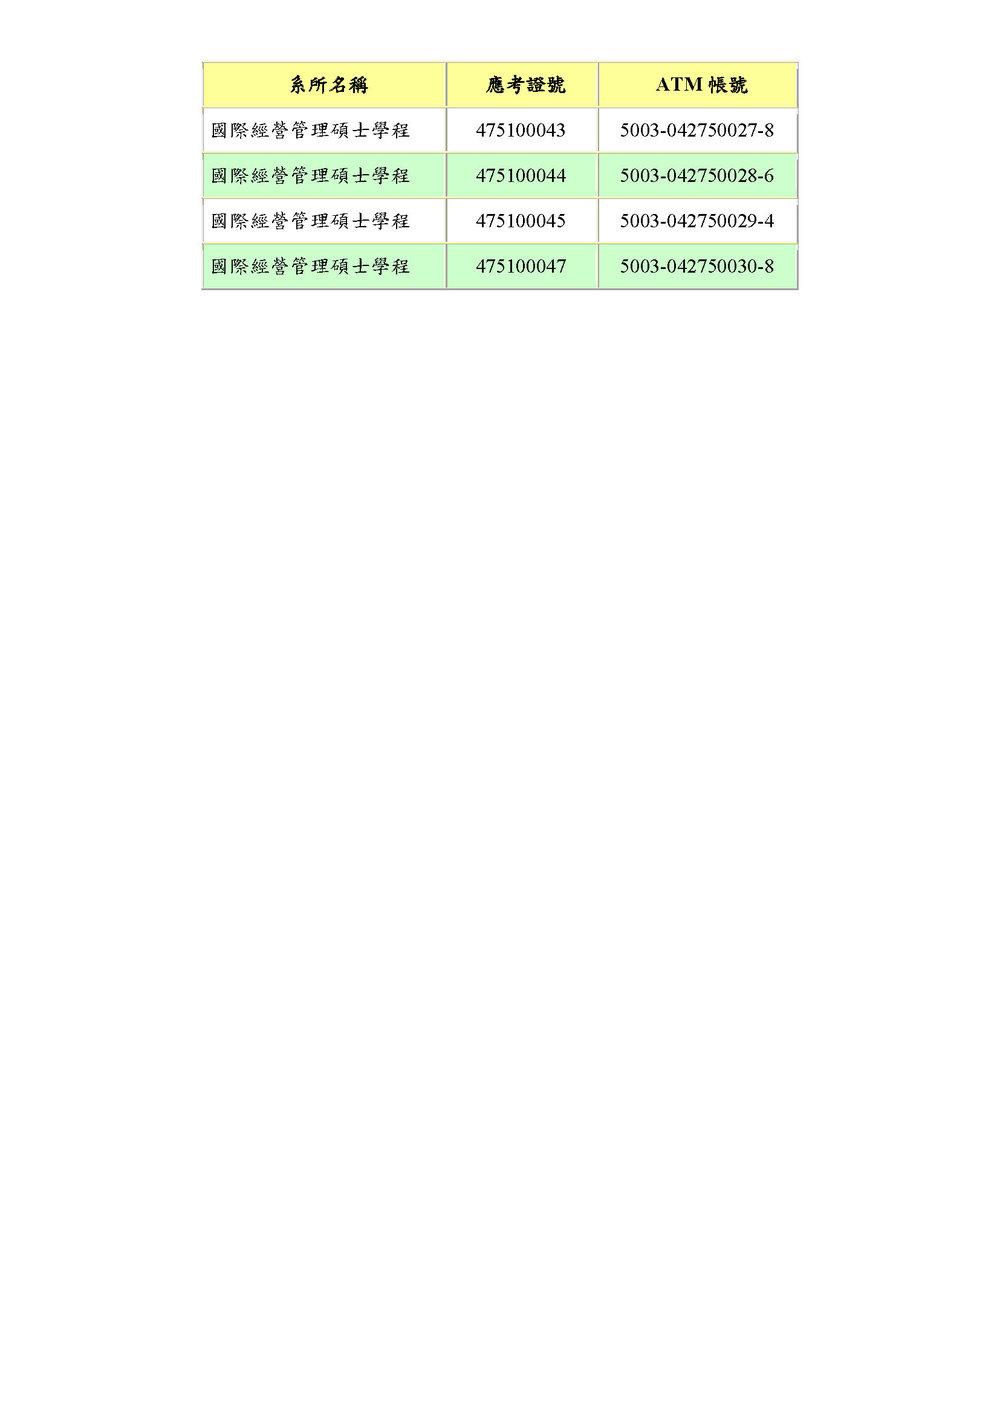 payment notice-2.jpg